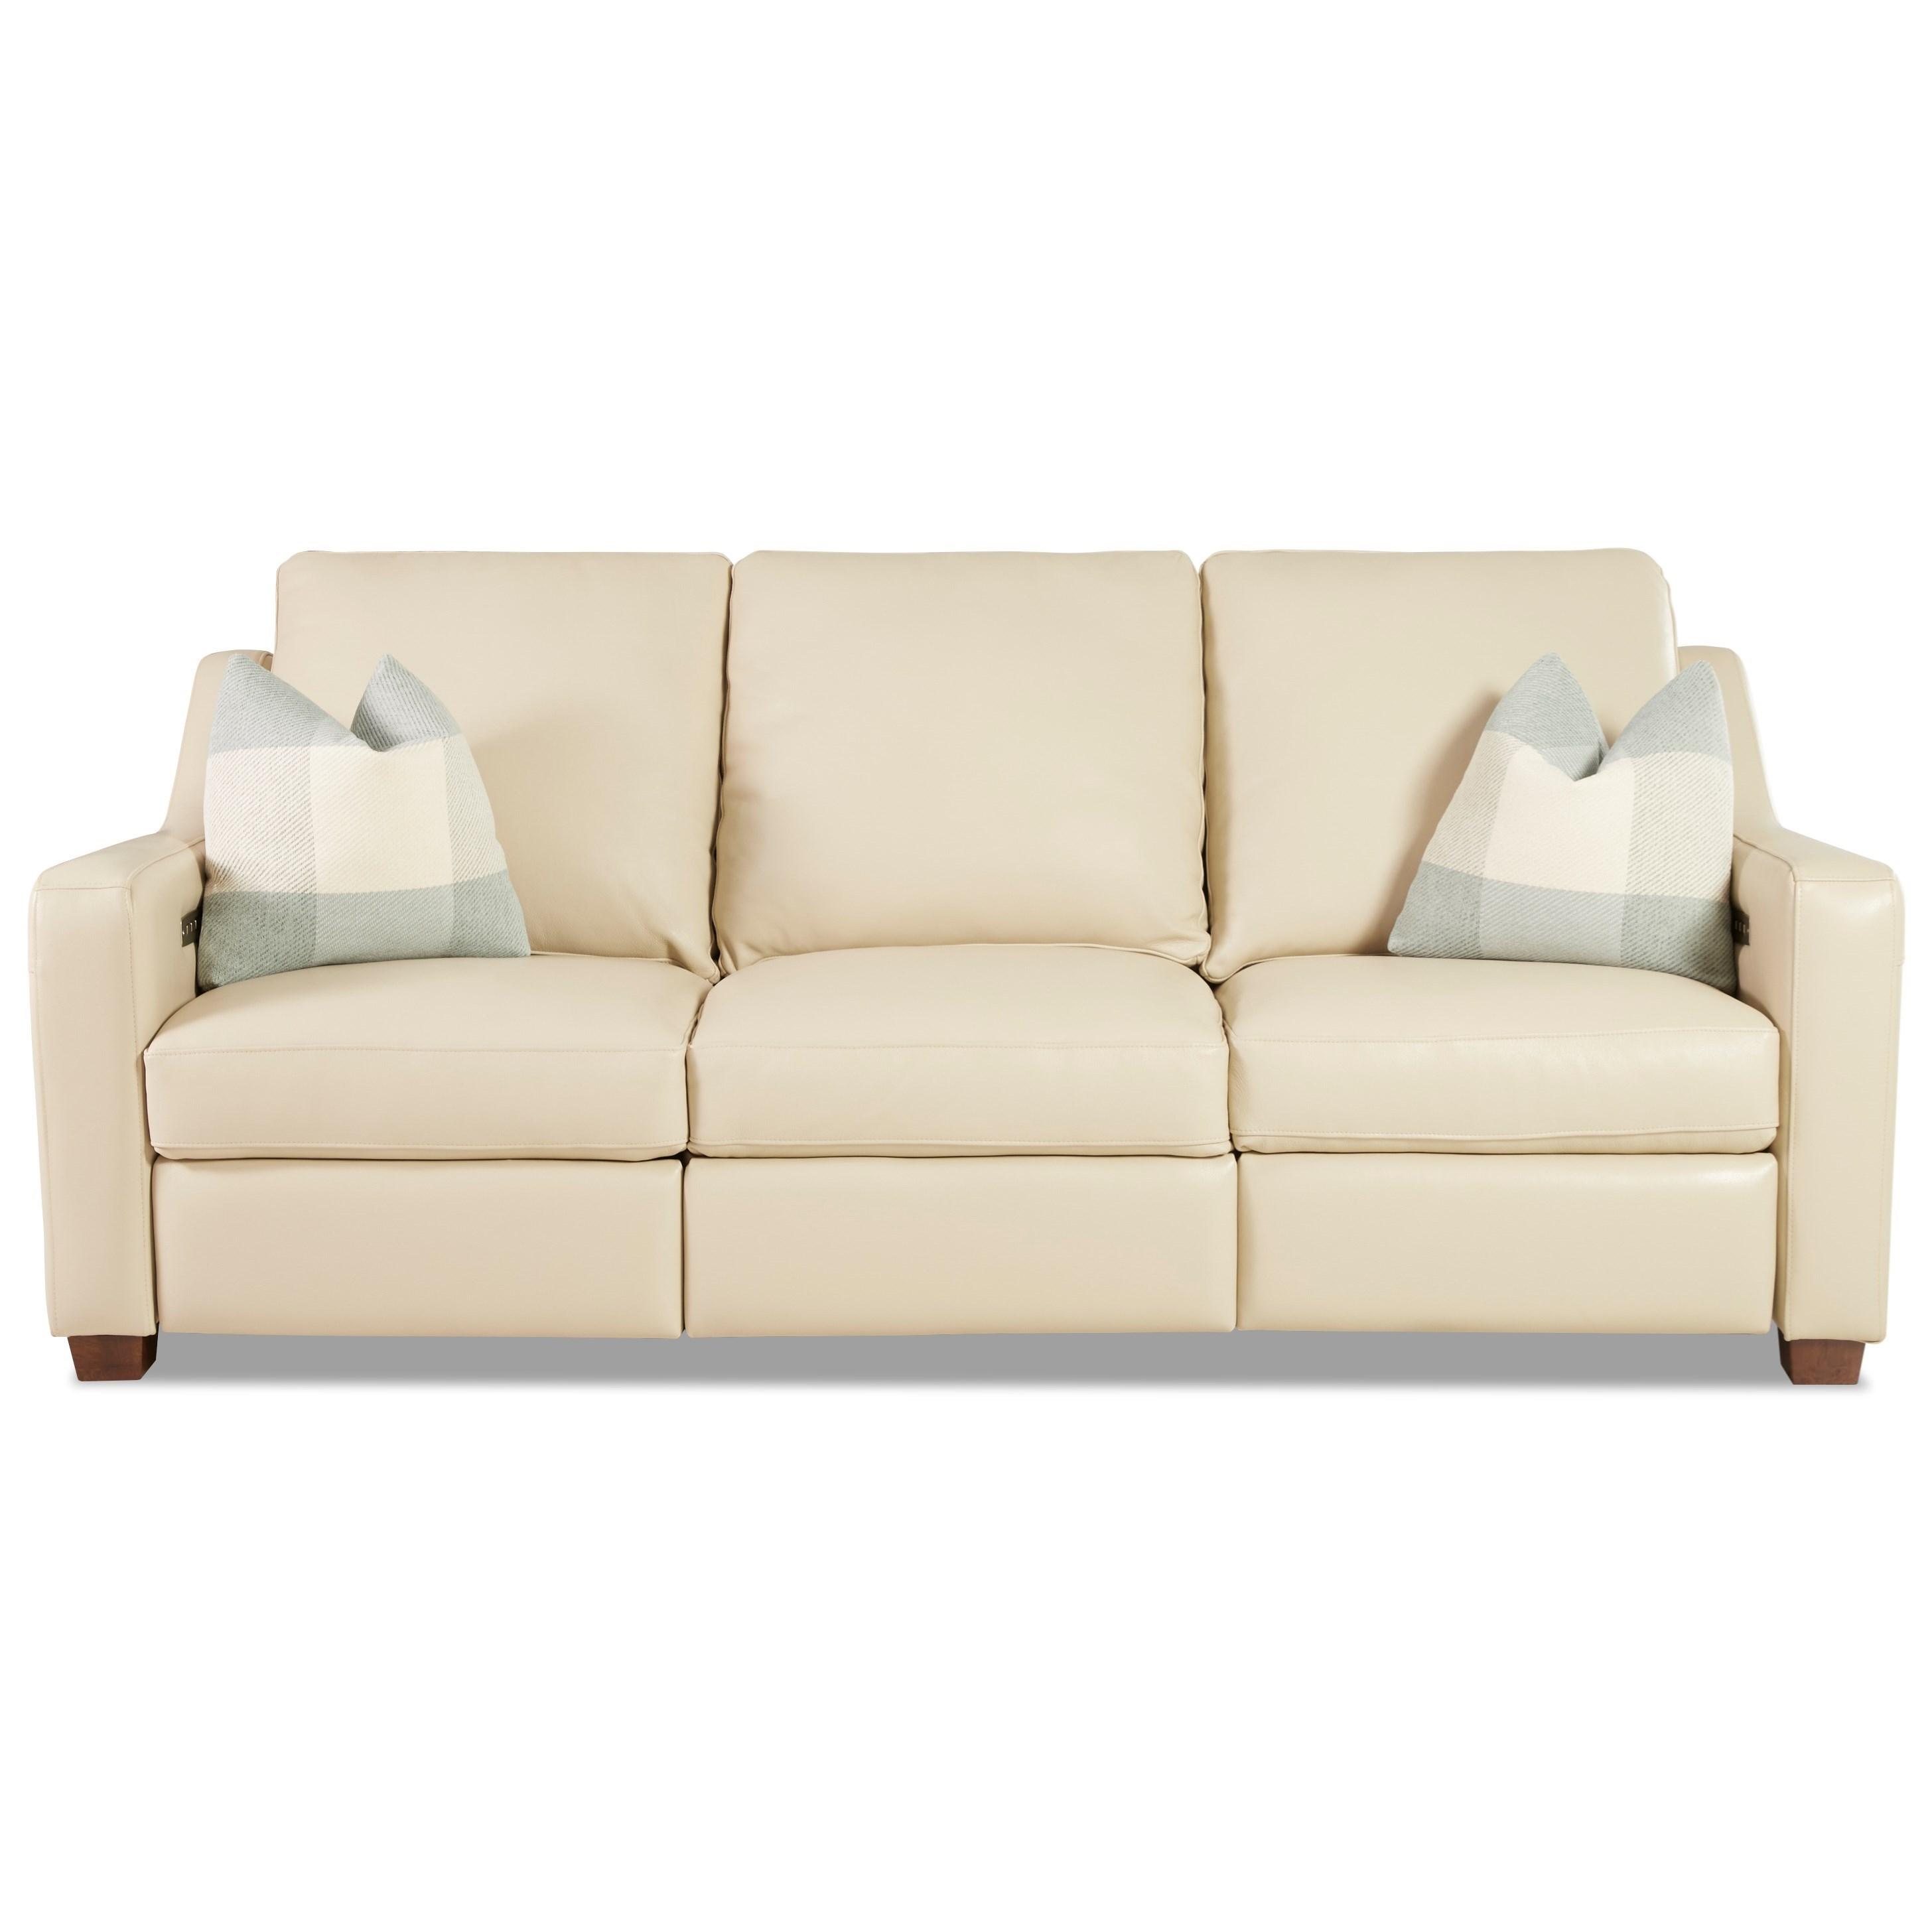 Pryor Power Reclining Sofa by Klaussner at Johnny Janosik